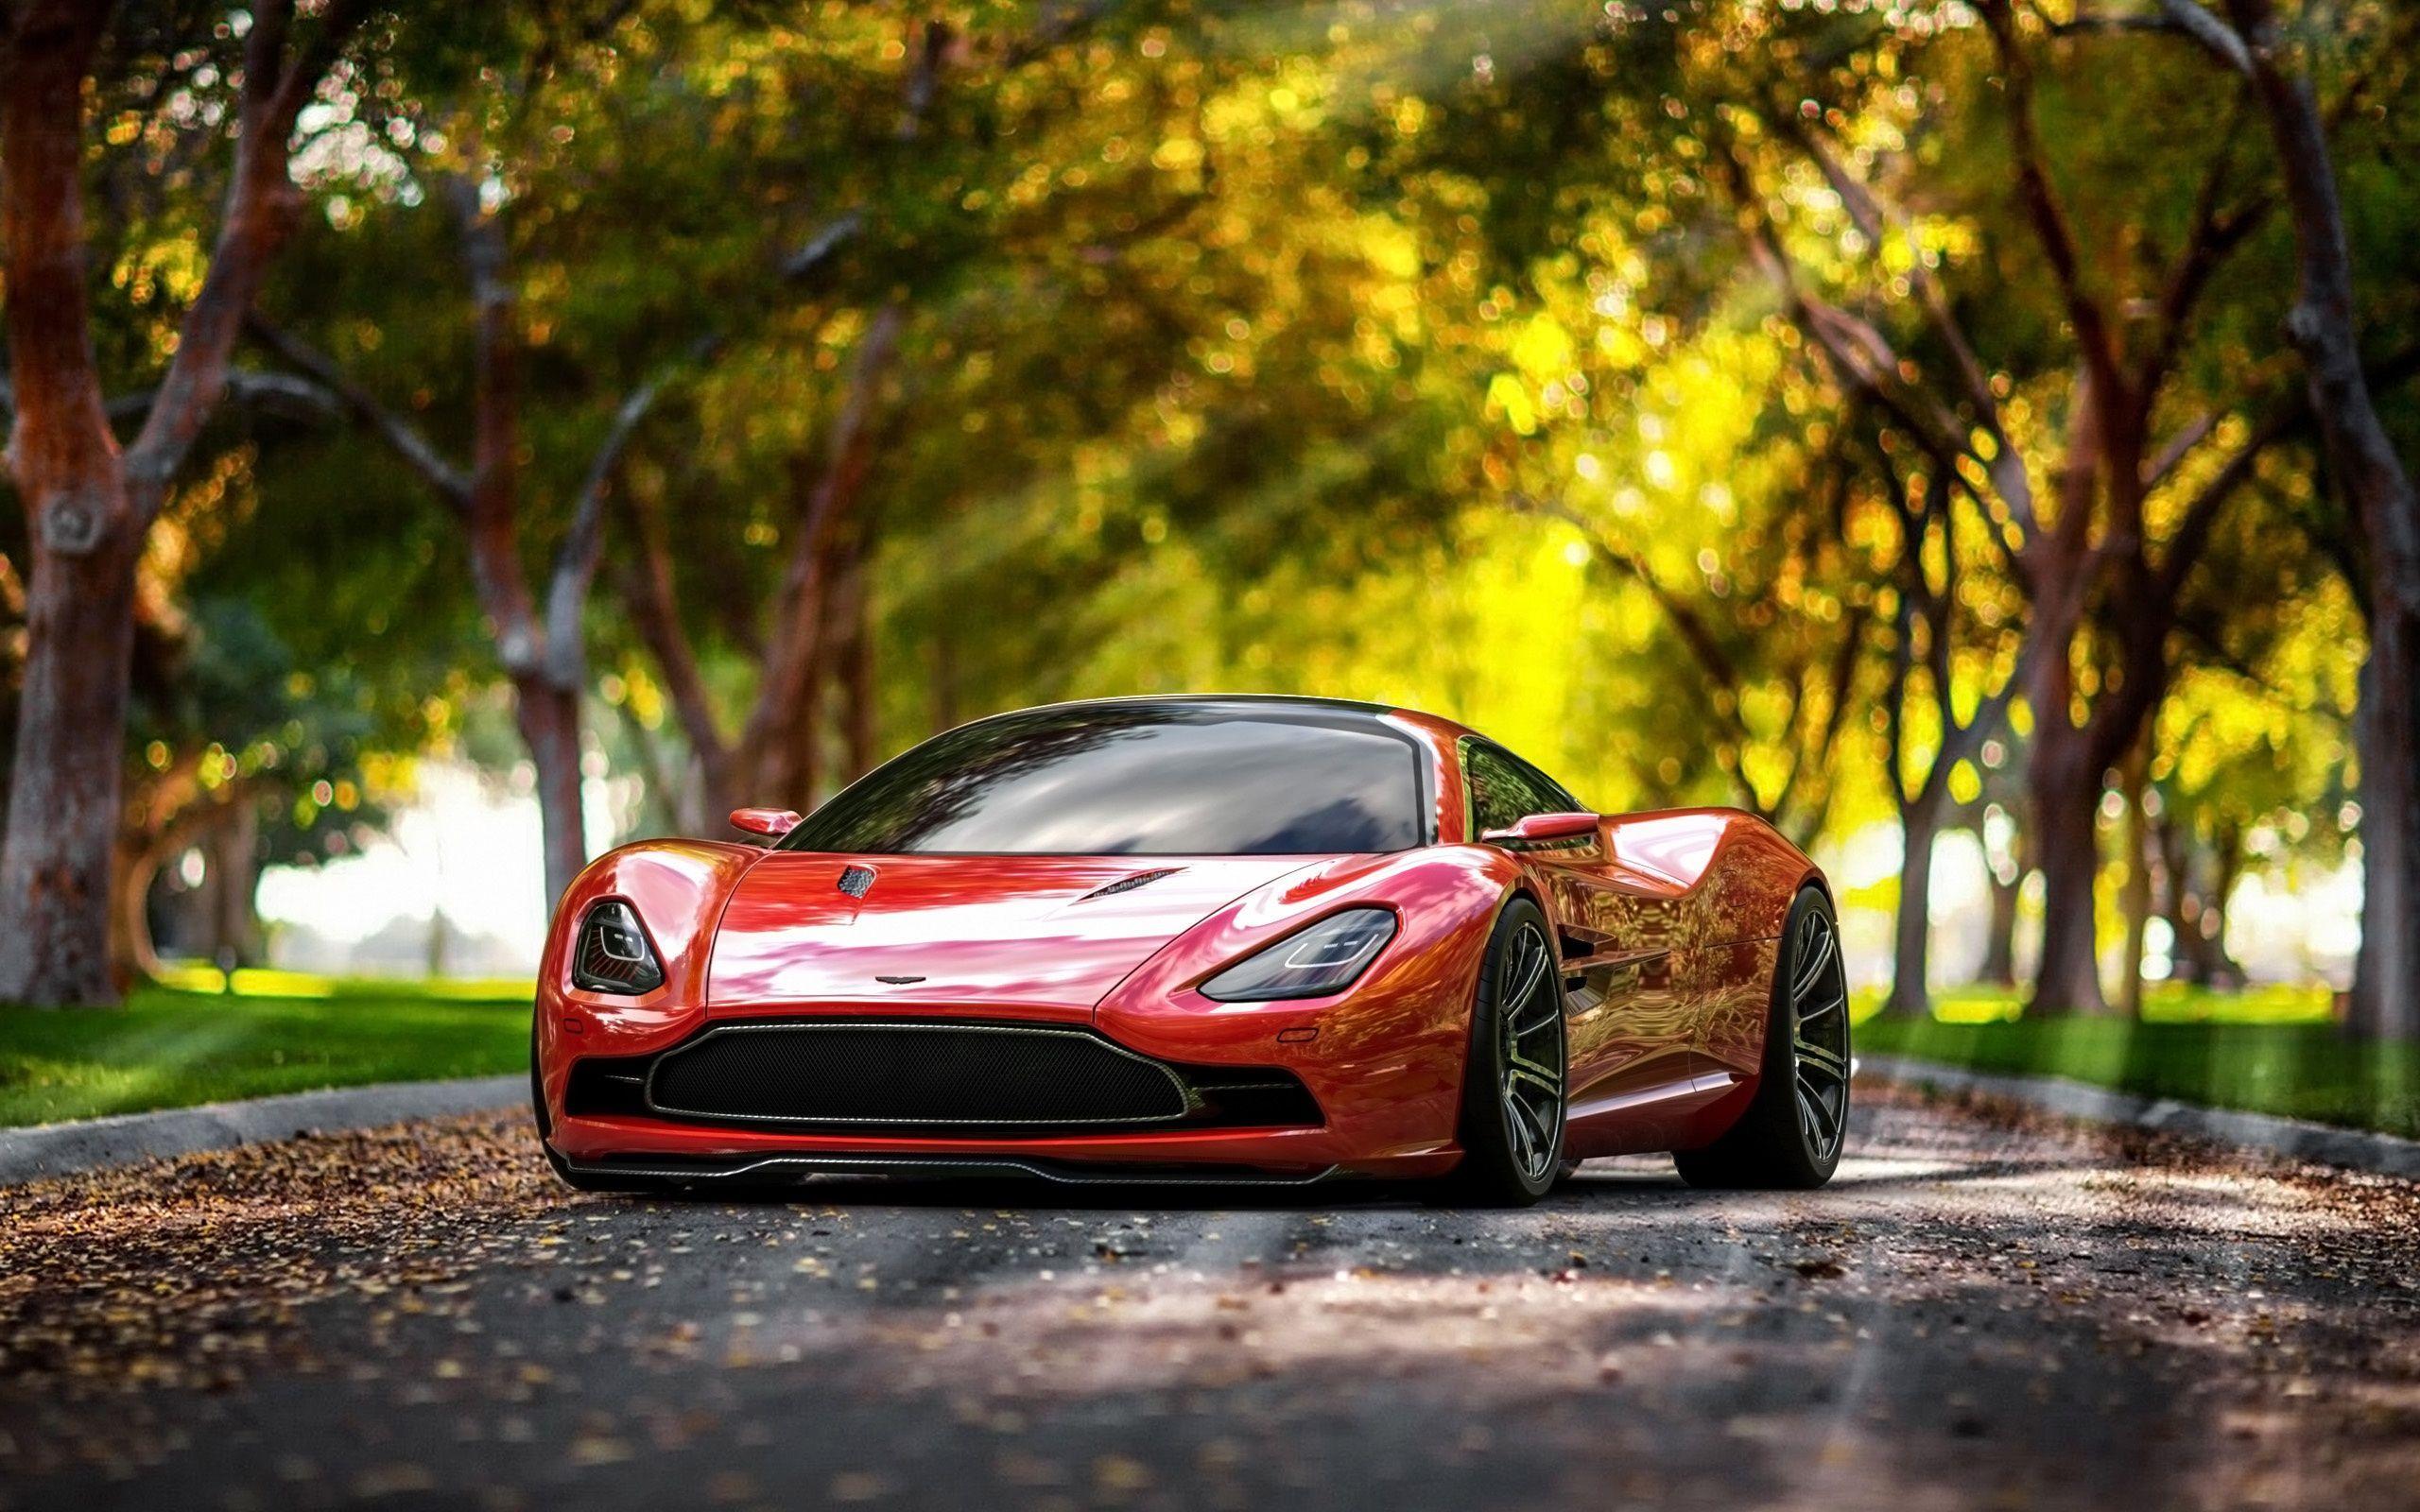 Ultra Hd Car Wallpapers Top Free Ultra Hd Car Backgrounds Wallpaperaccess